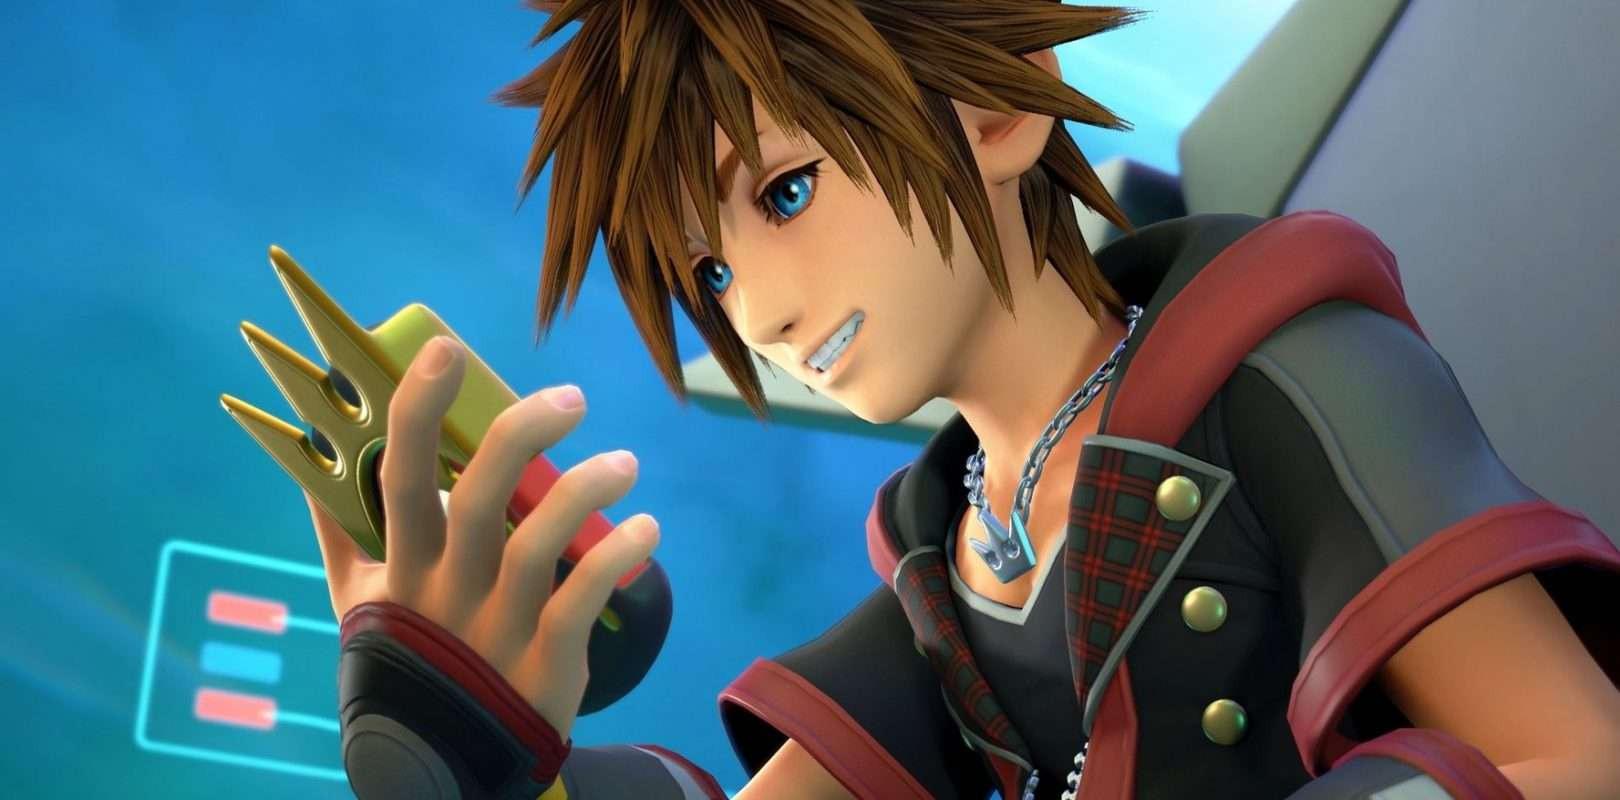 Kingdom Hearts Iii - Recensione, No Spoiler! 15 - Hynerd.it